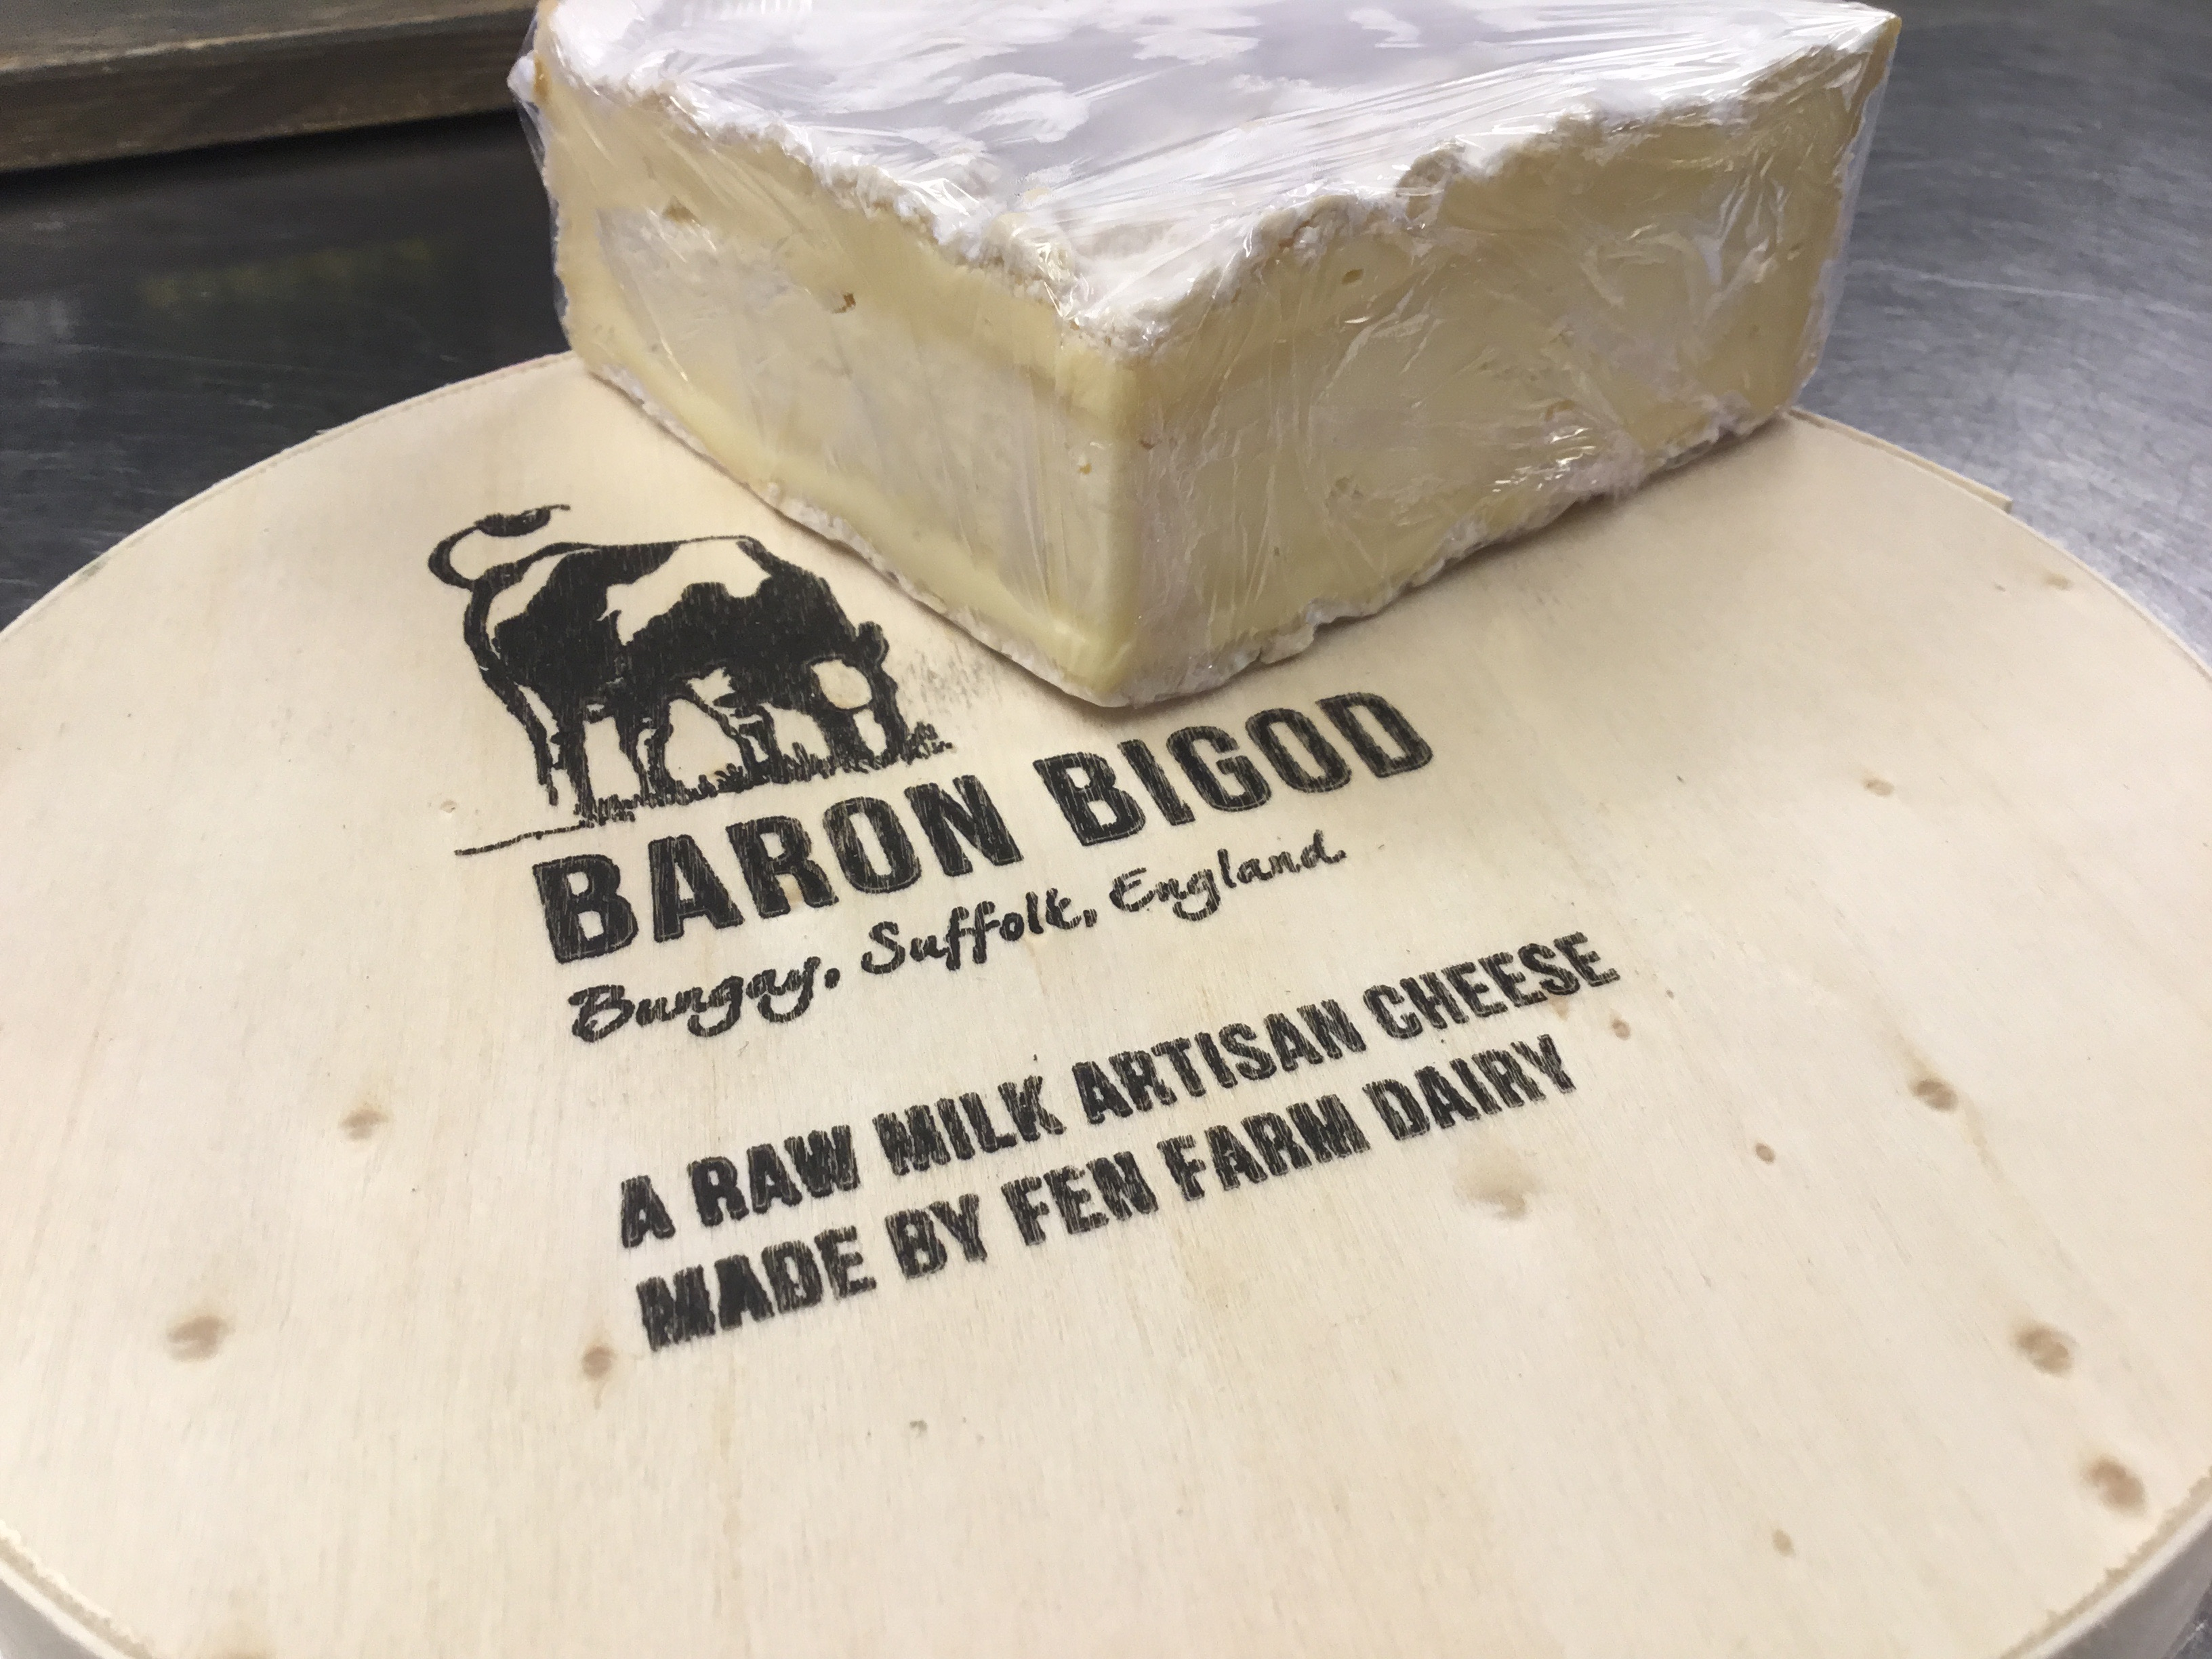 Baron Bigod Raw milk artisan cheese Brie Style Portions